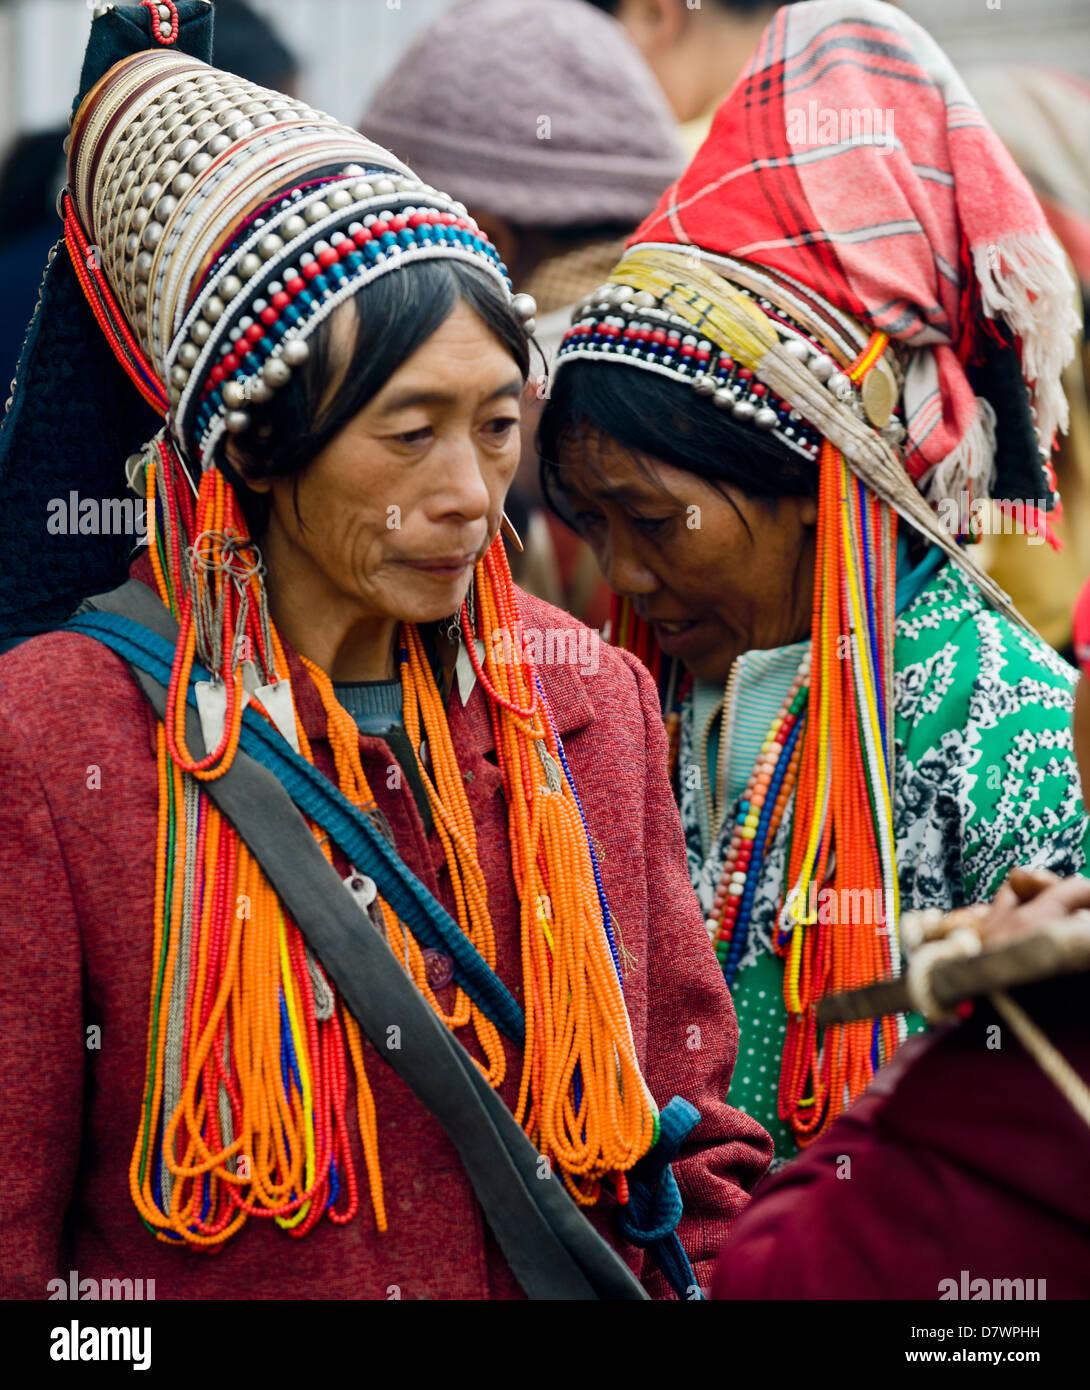 Akha women at Xiding weekly market, in the hills west of Menghai, Xishuangbanna, Yunnan, China. - Stock Image